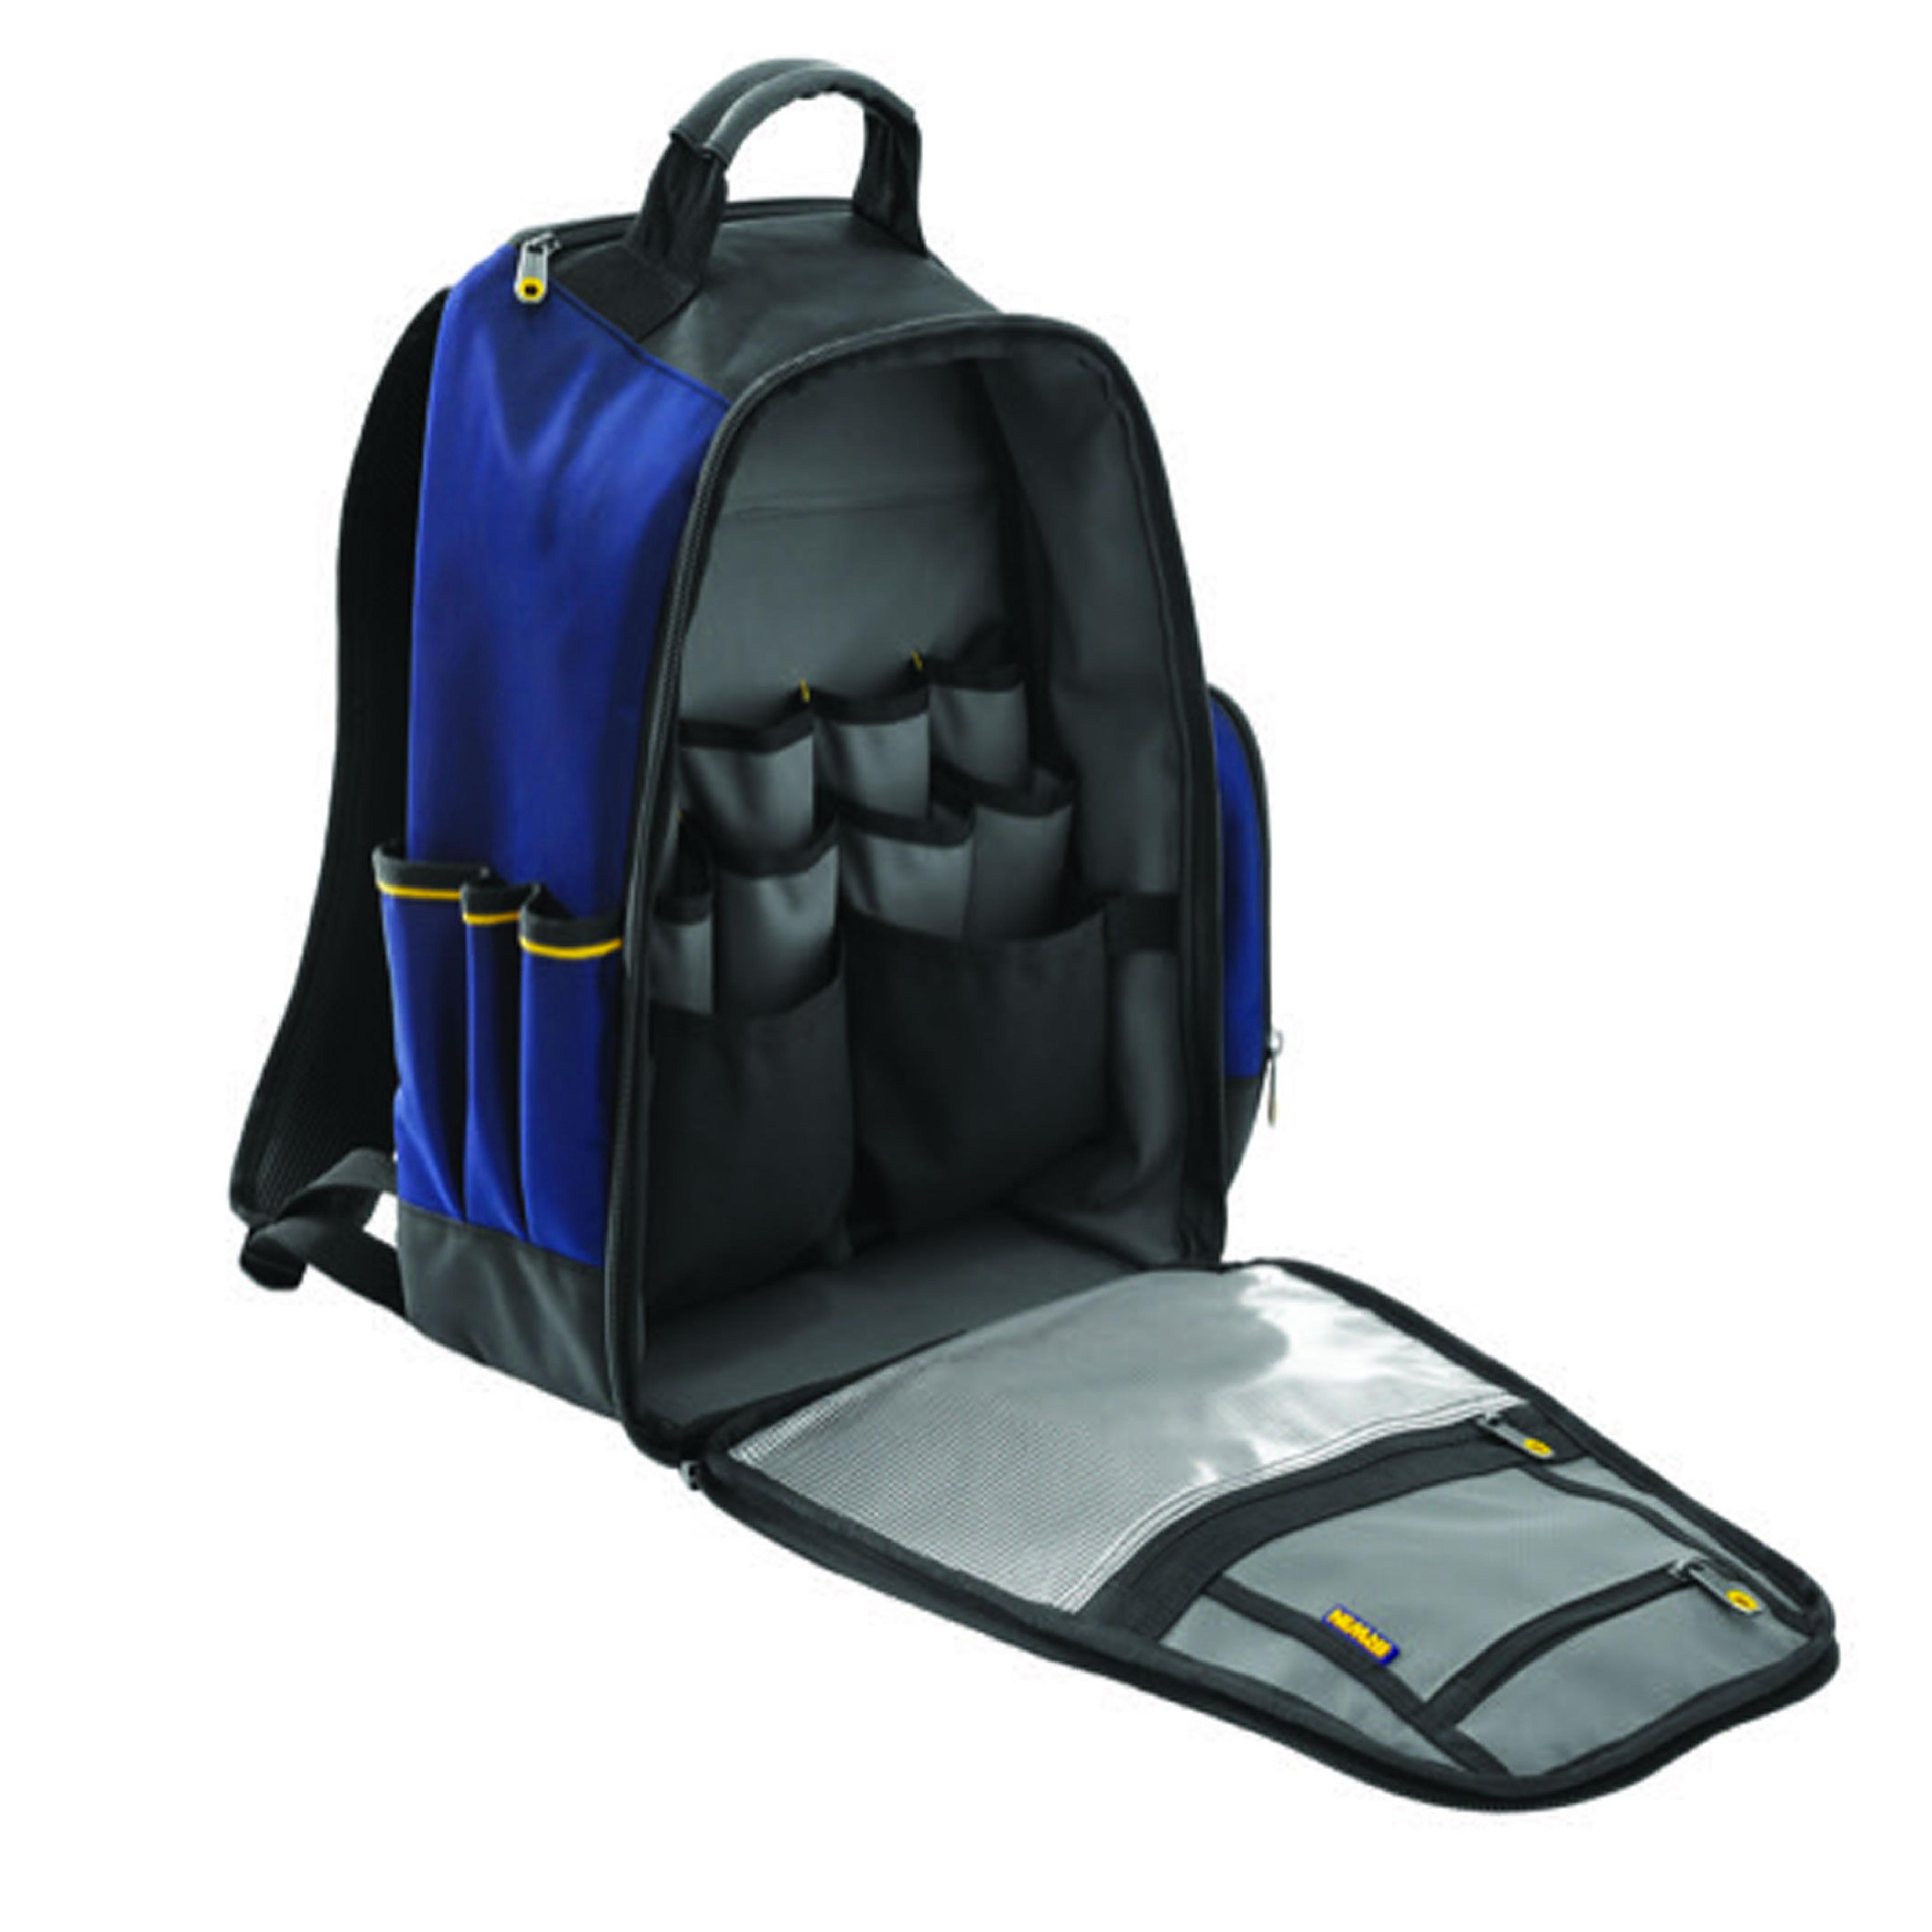 IRWIN 2017826 - Defender Backpack 330 x 175 x 470 mm, 1680 Denier Material